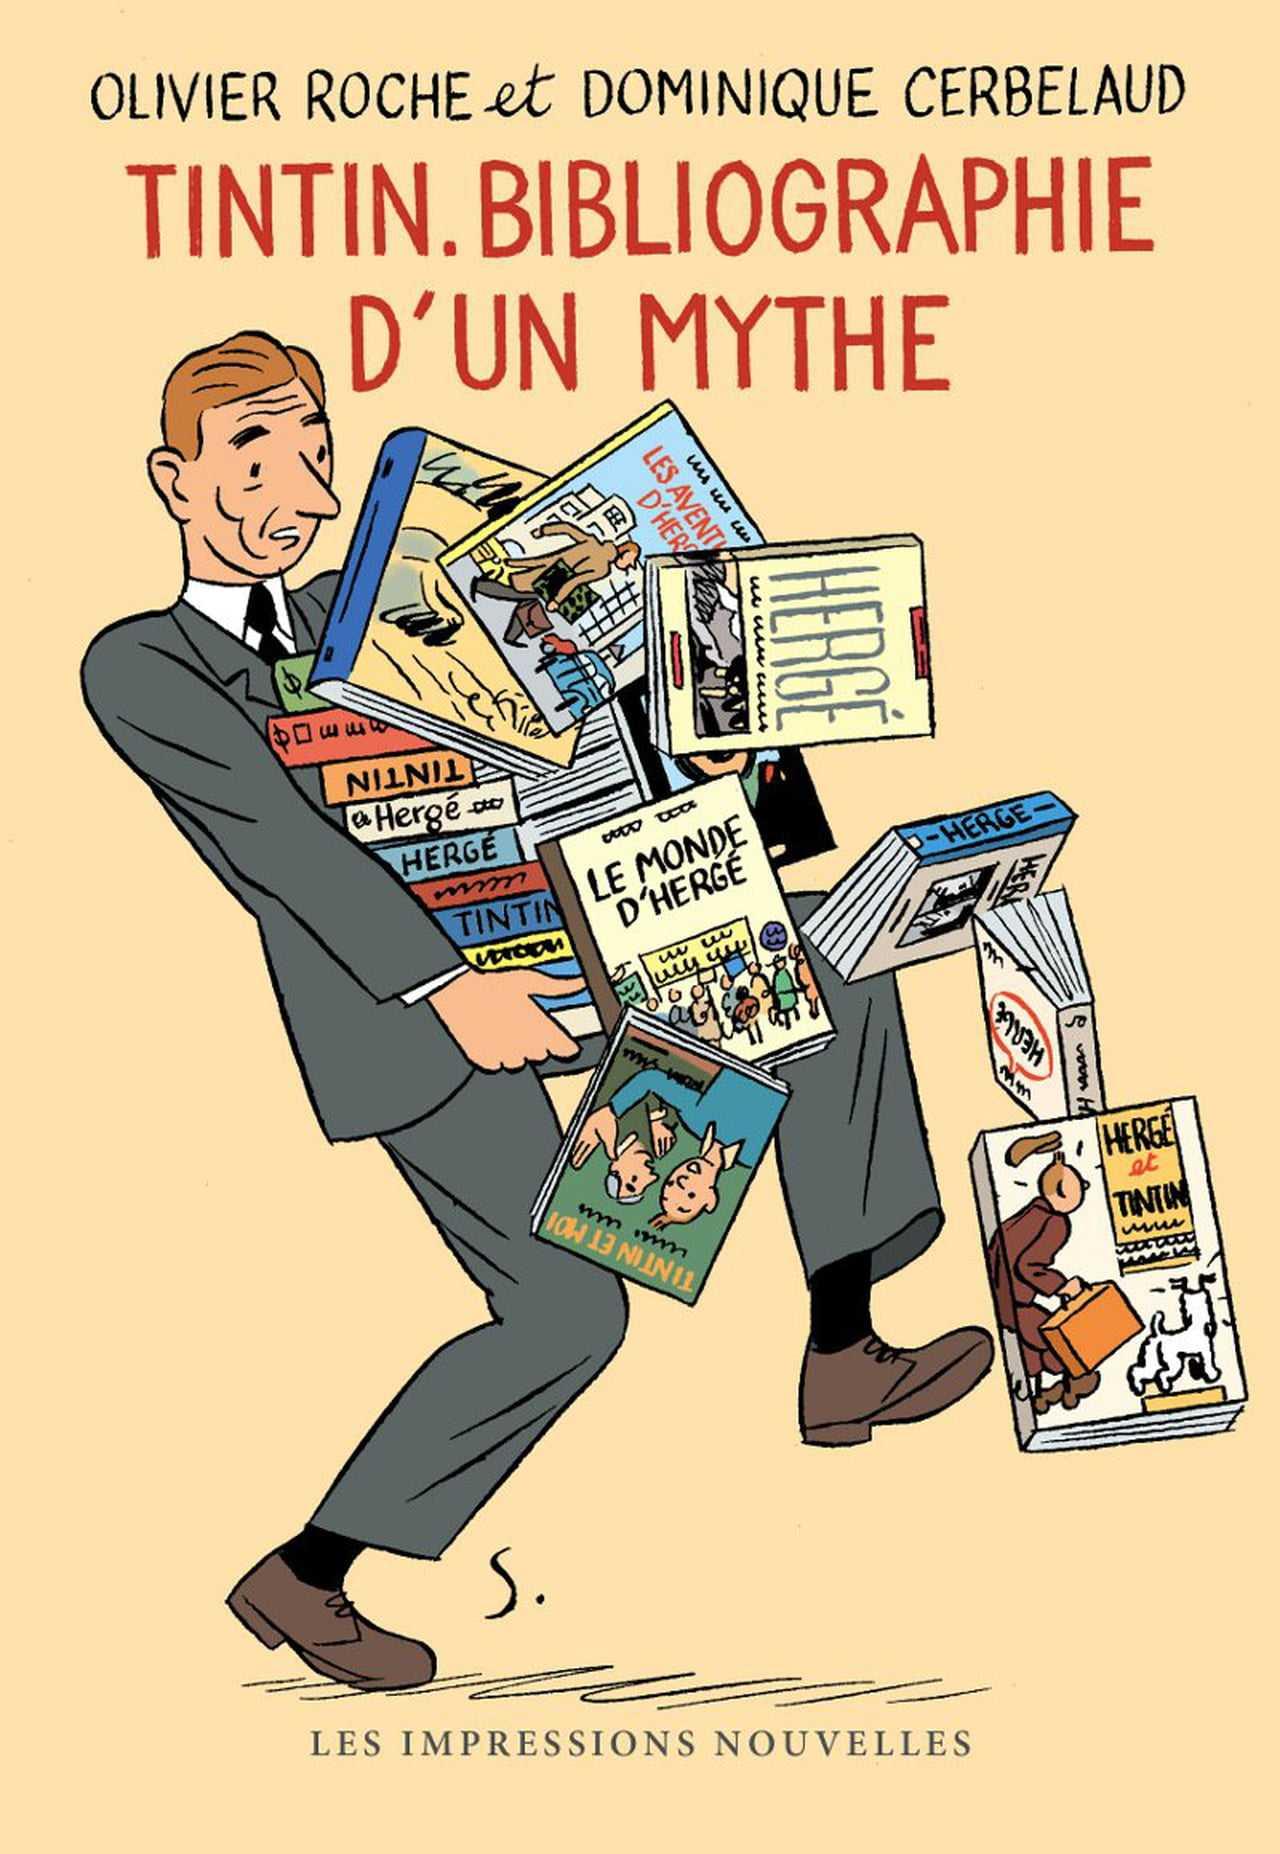 Tintin, bibliographie d'un mythe éternel